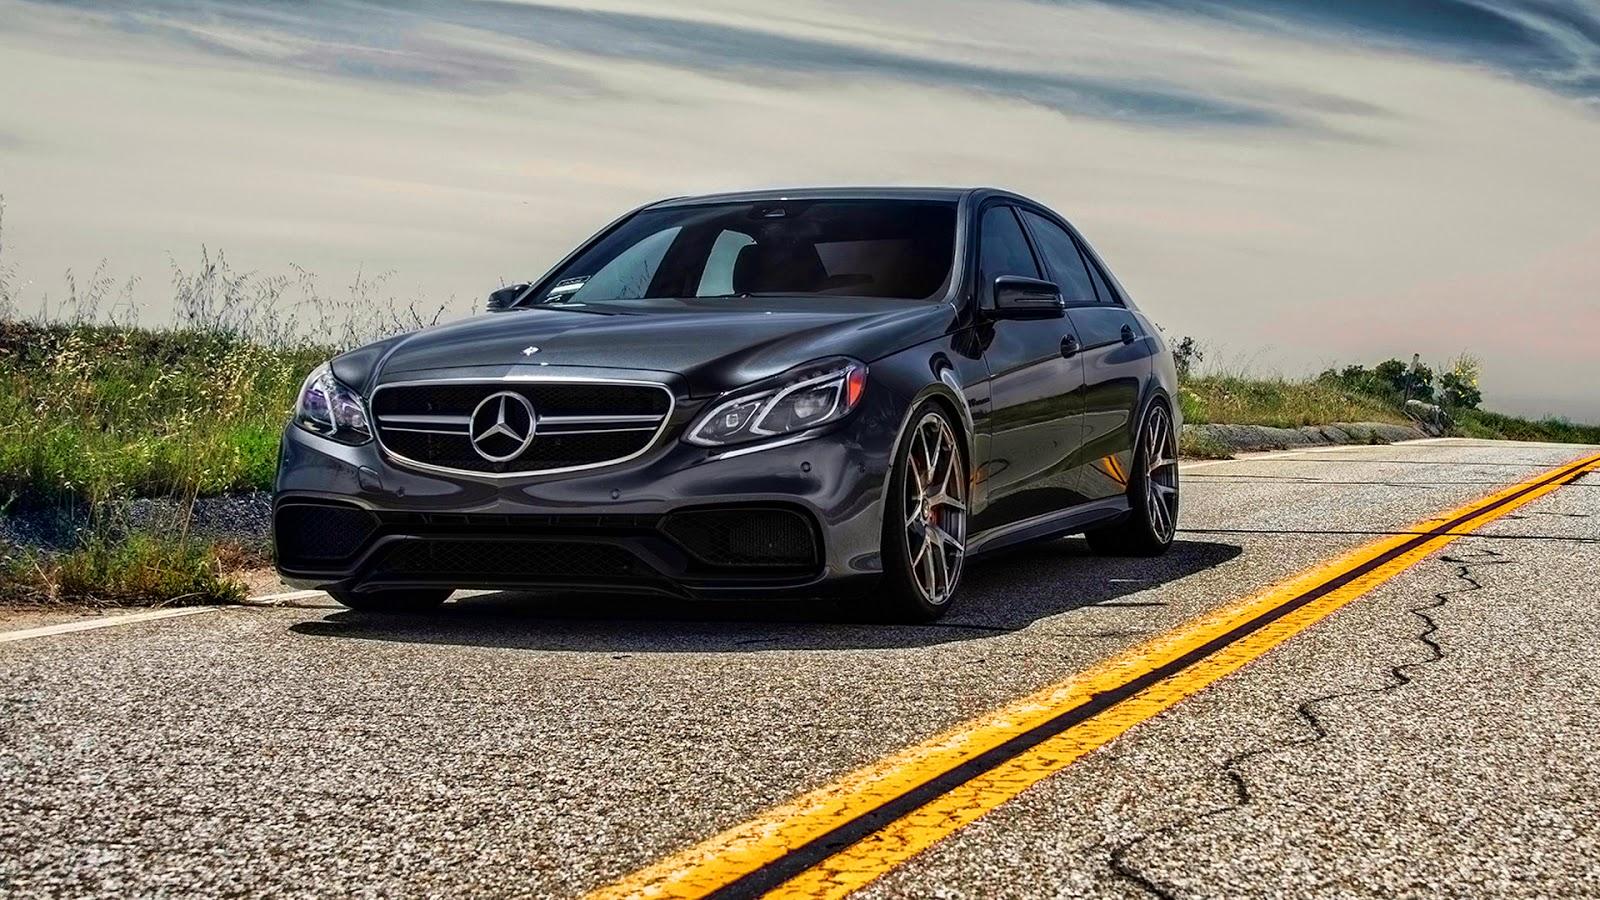 Vorsteiner mercedes benz e 63 amg 2014 aro 20 carwp for Mercedes benz e350 tire size